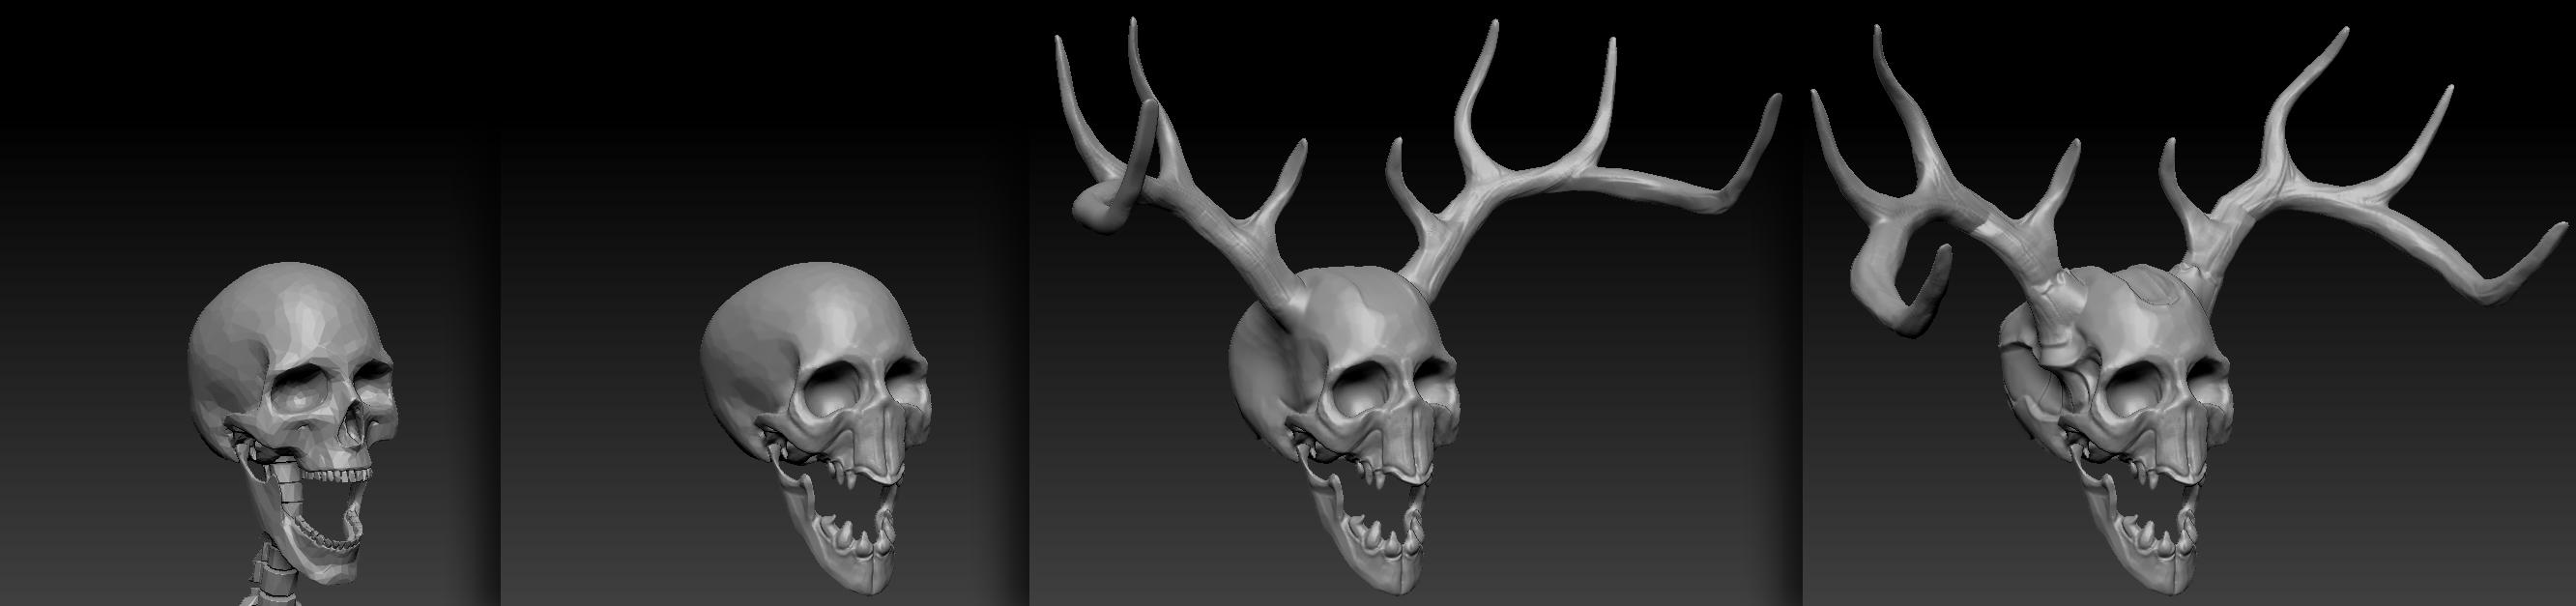 Progress on the Banshee's skull, from left to right